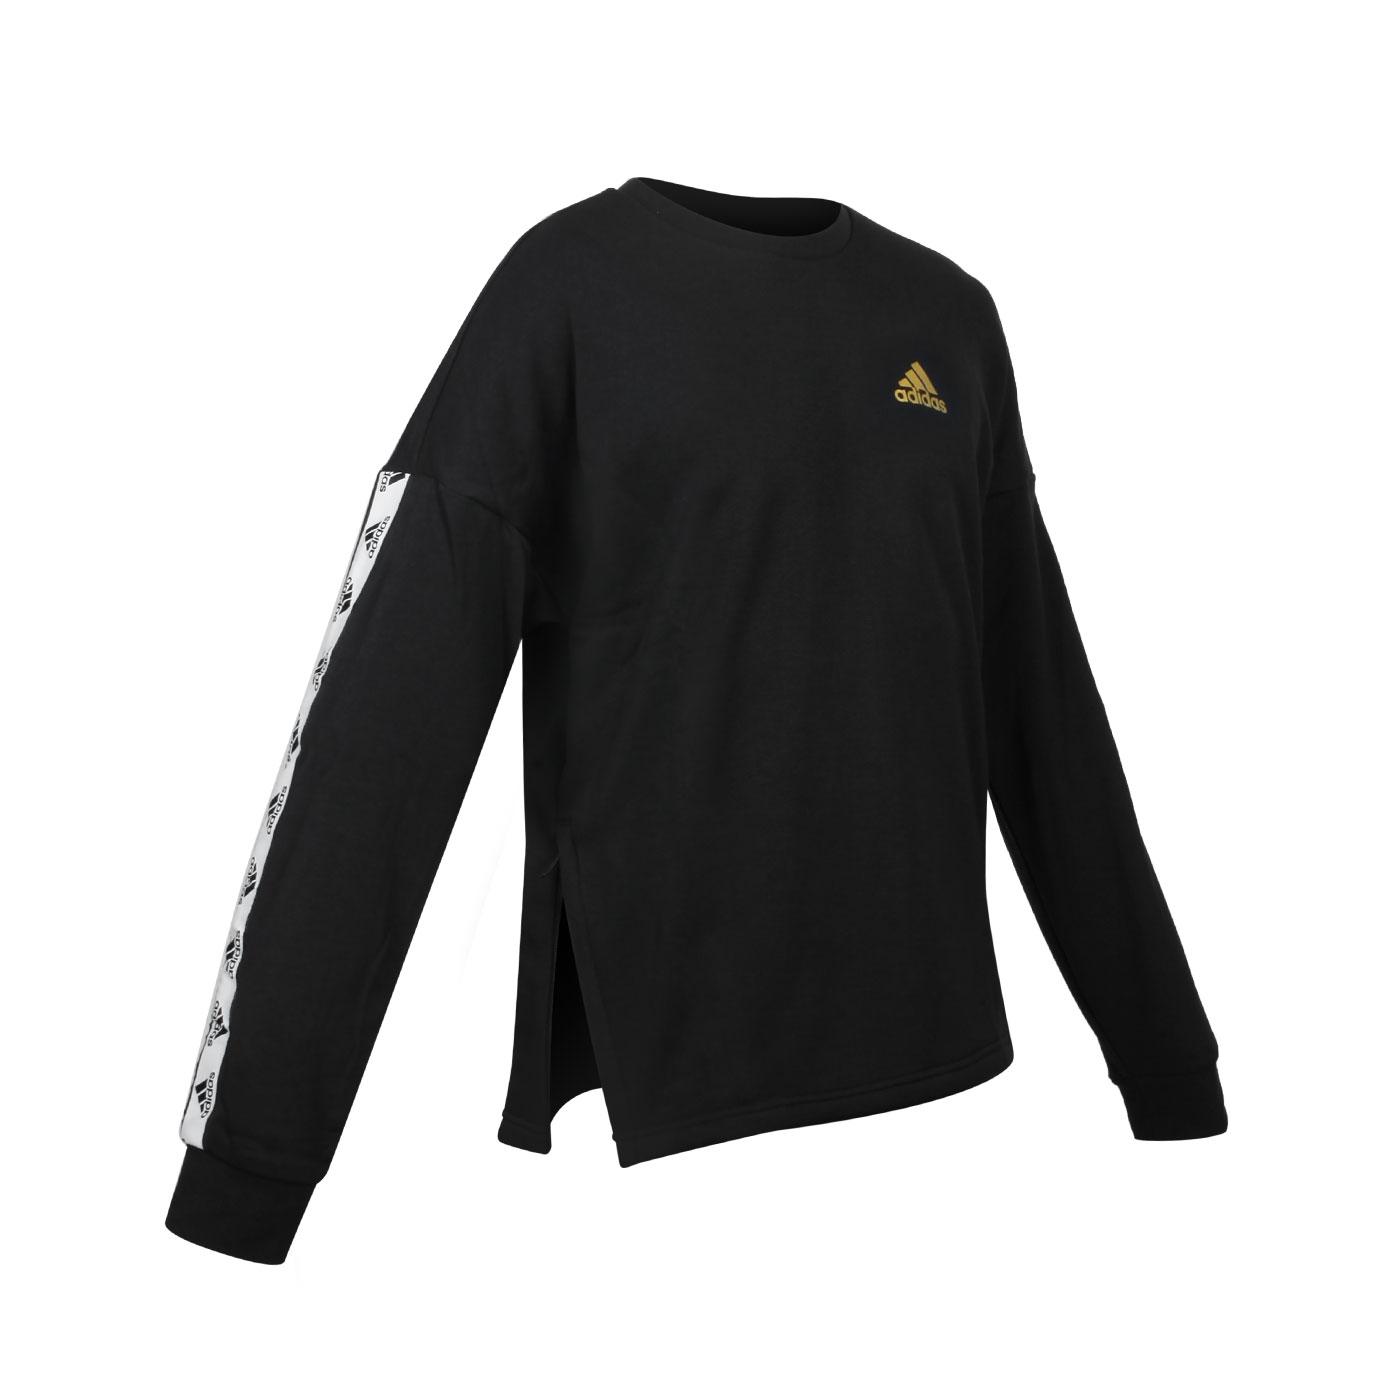 ADIDAS 男款長袖T恤 GL2215 - 黑金